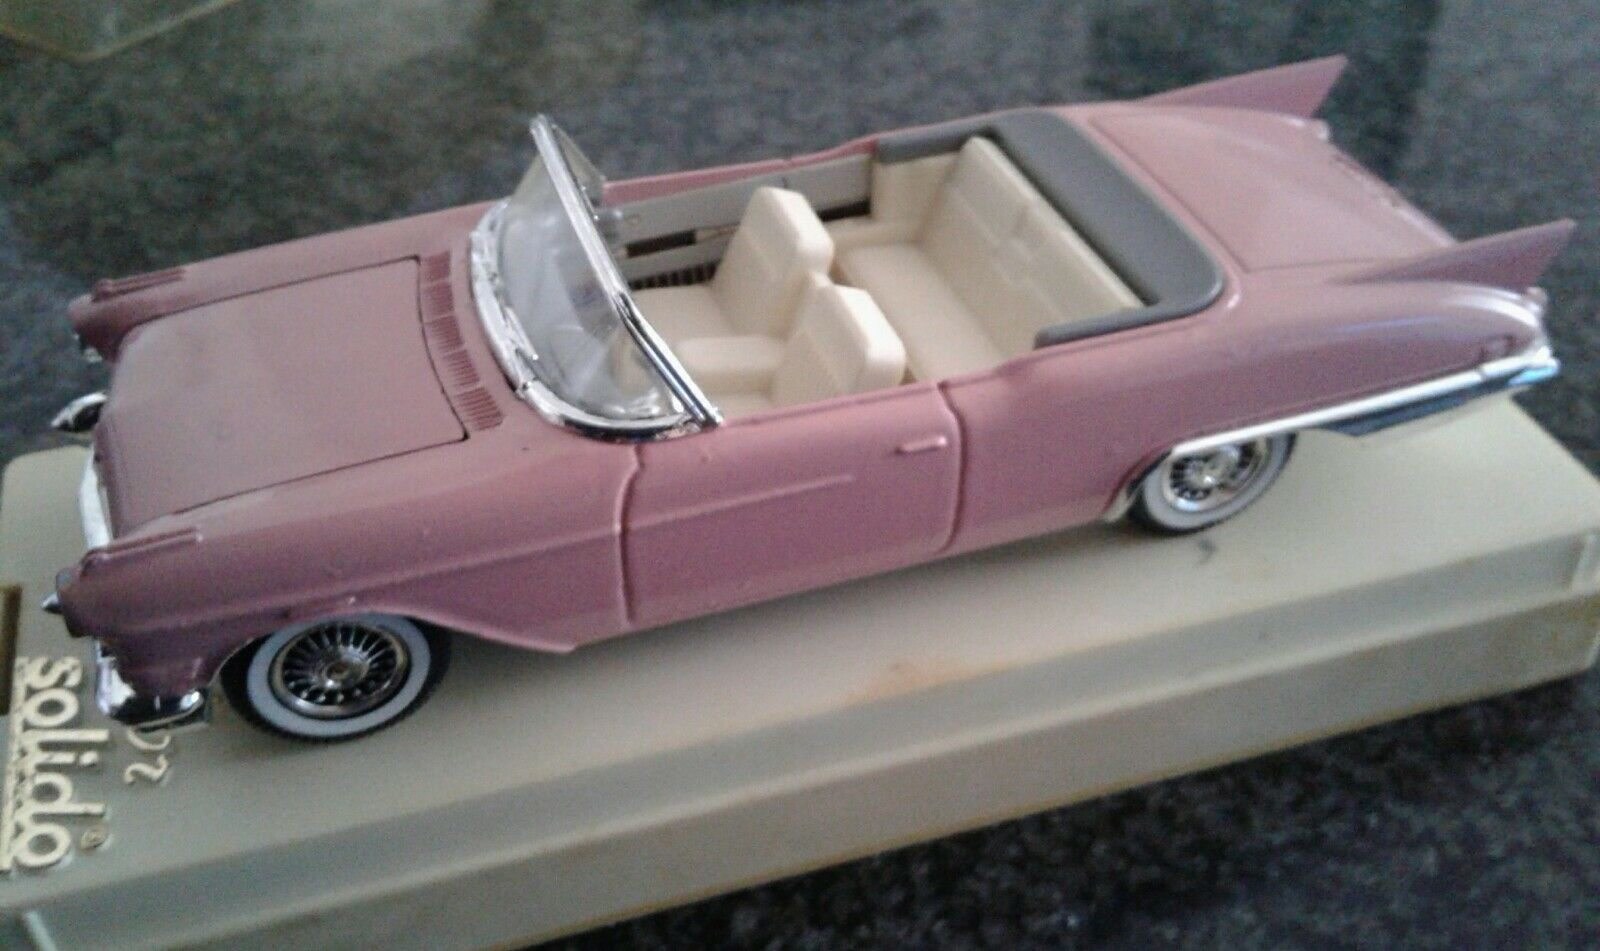 CADILLAC BIARRITZ BIARRITZ BIARRITZ cabrio, 4500, SOLIDO, 1 43 MINT IN BOX 32506e